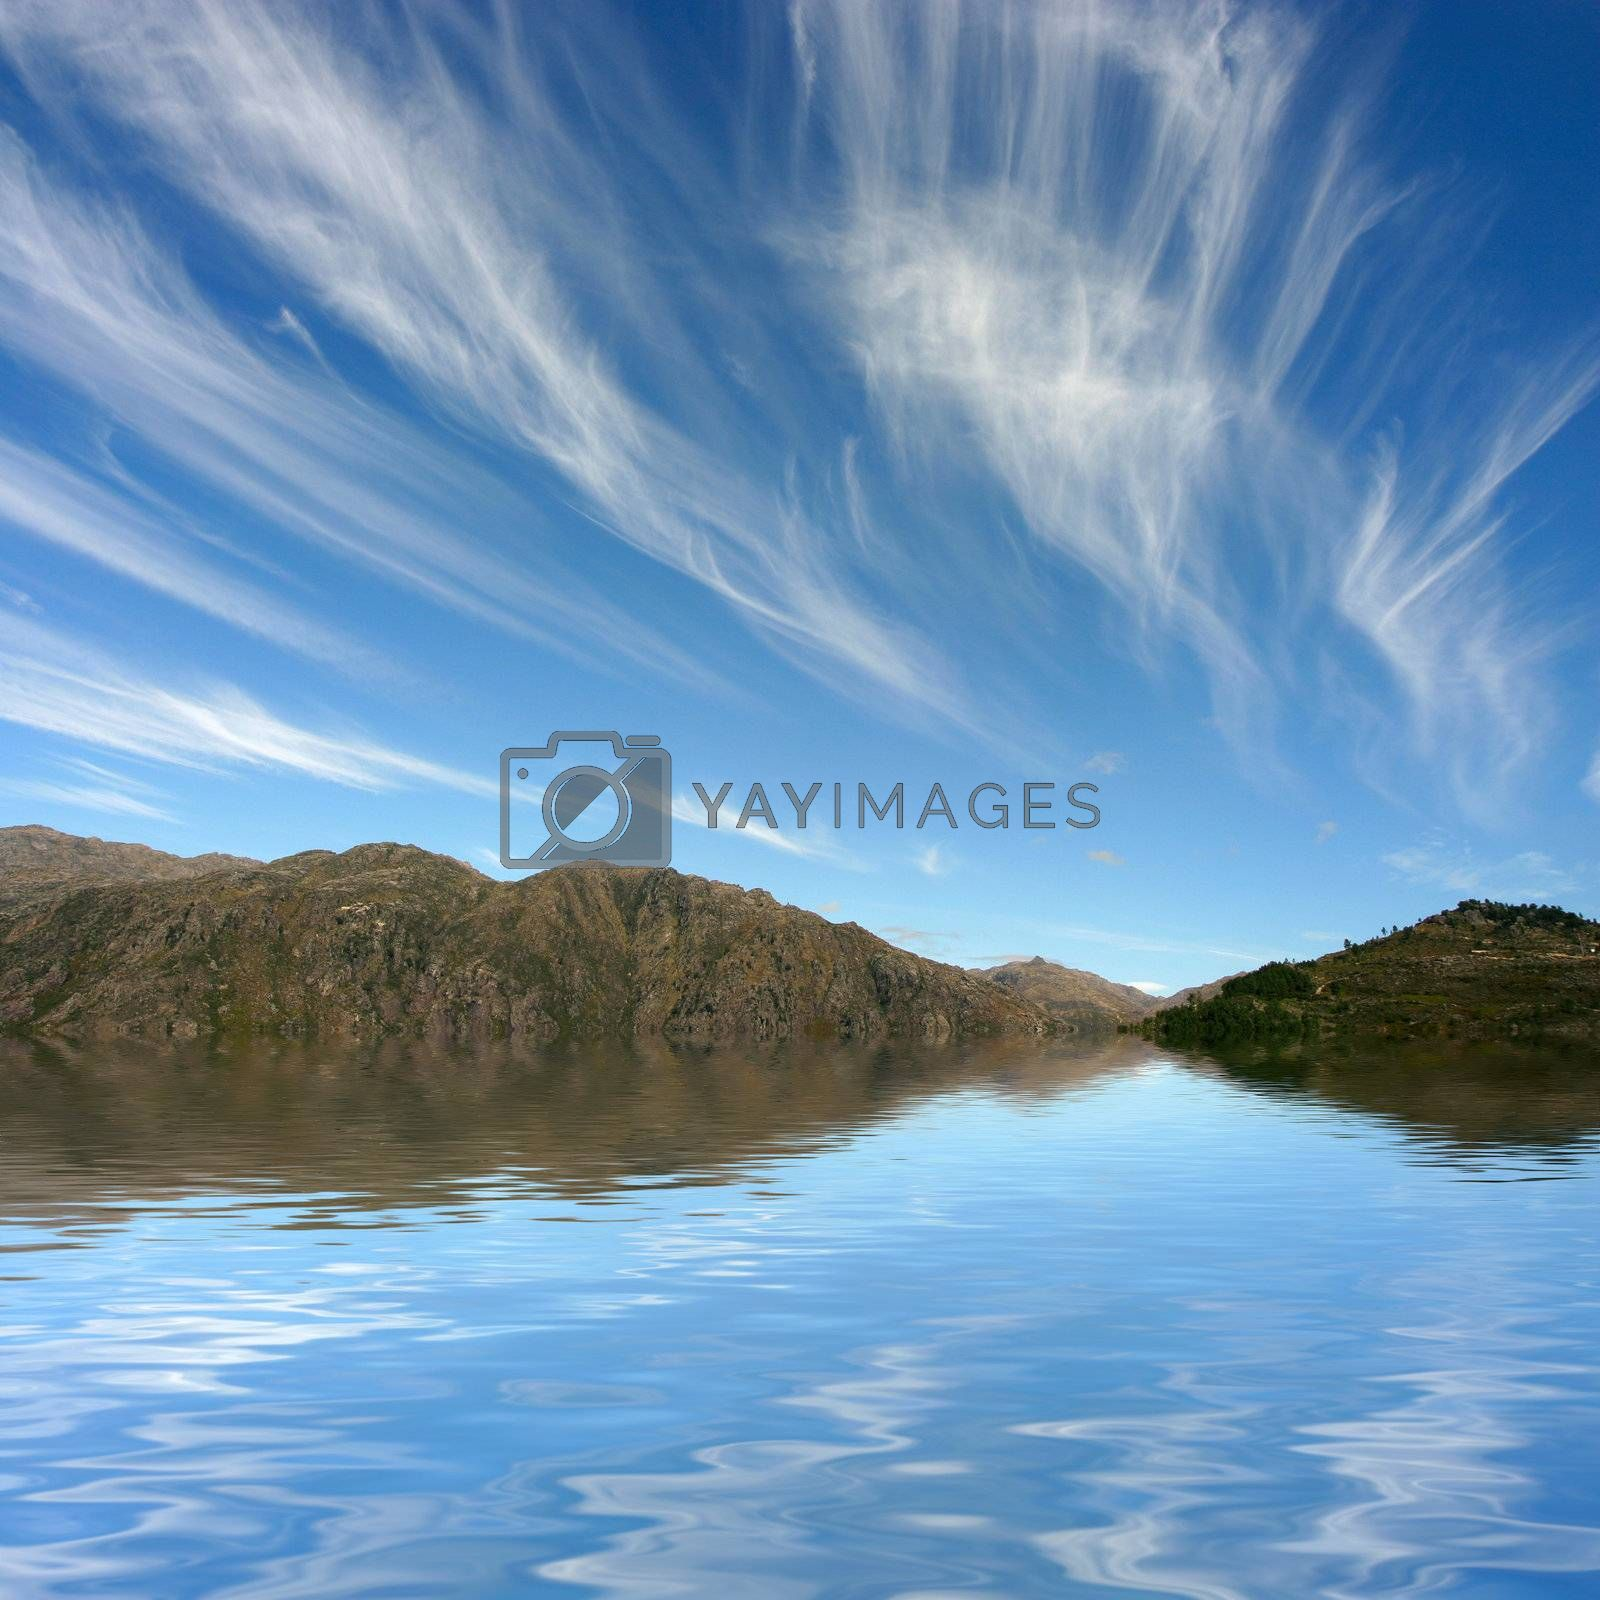 Royalty free image of Dreamy Sky by ajn